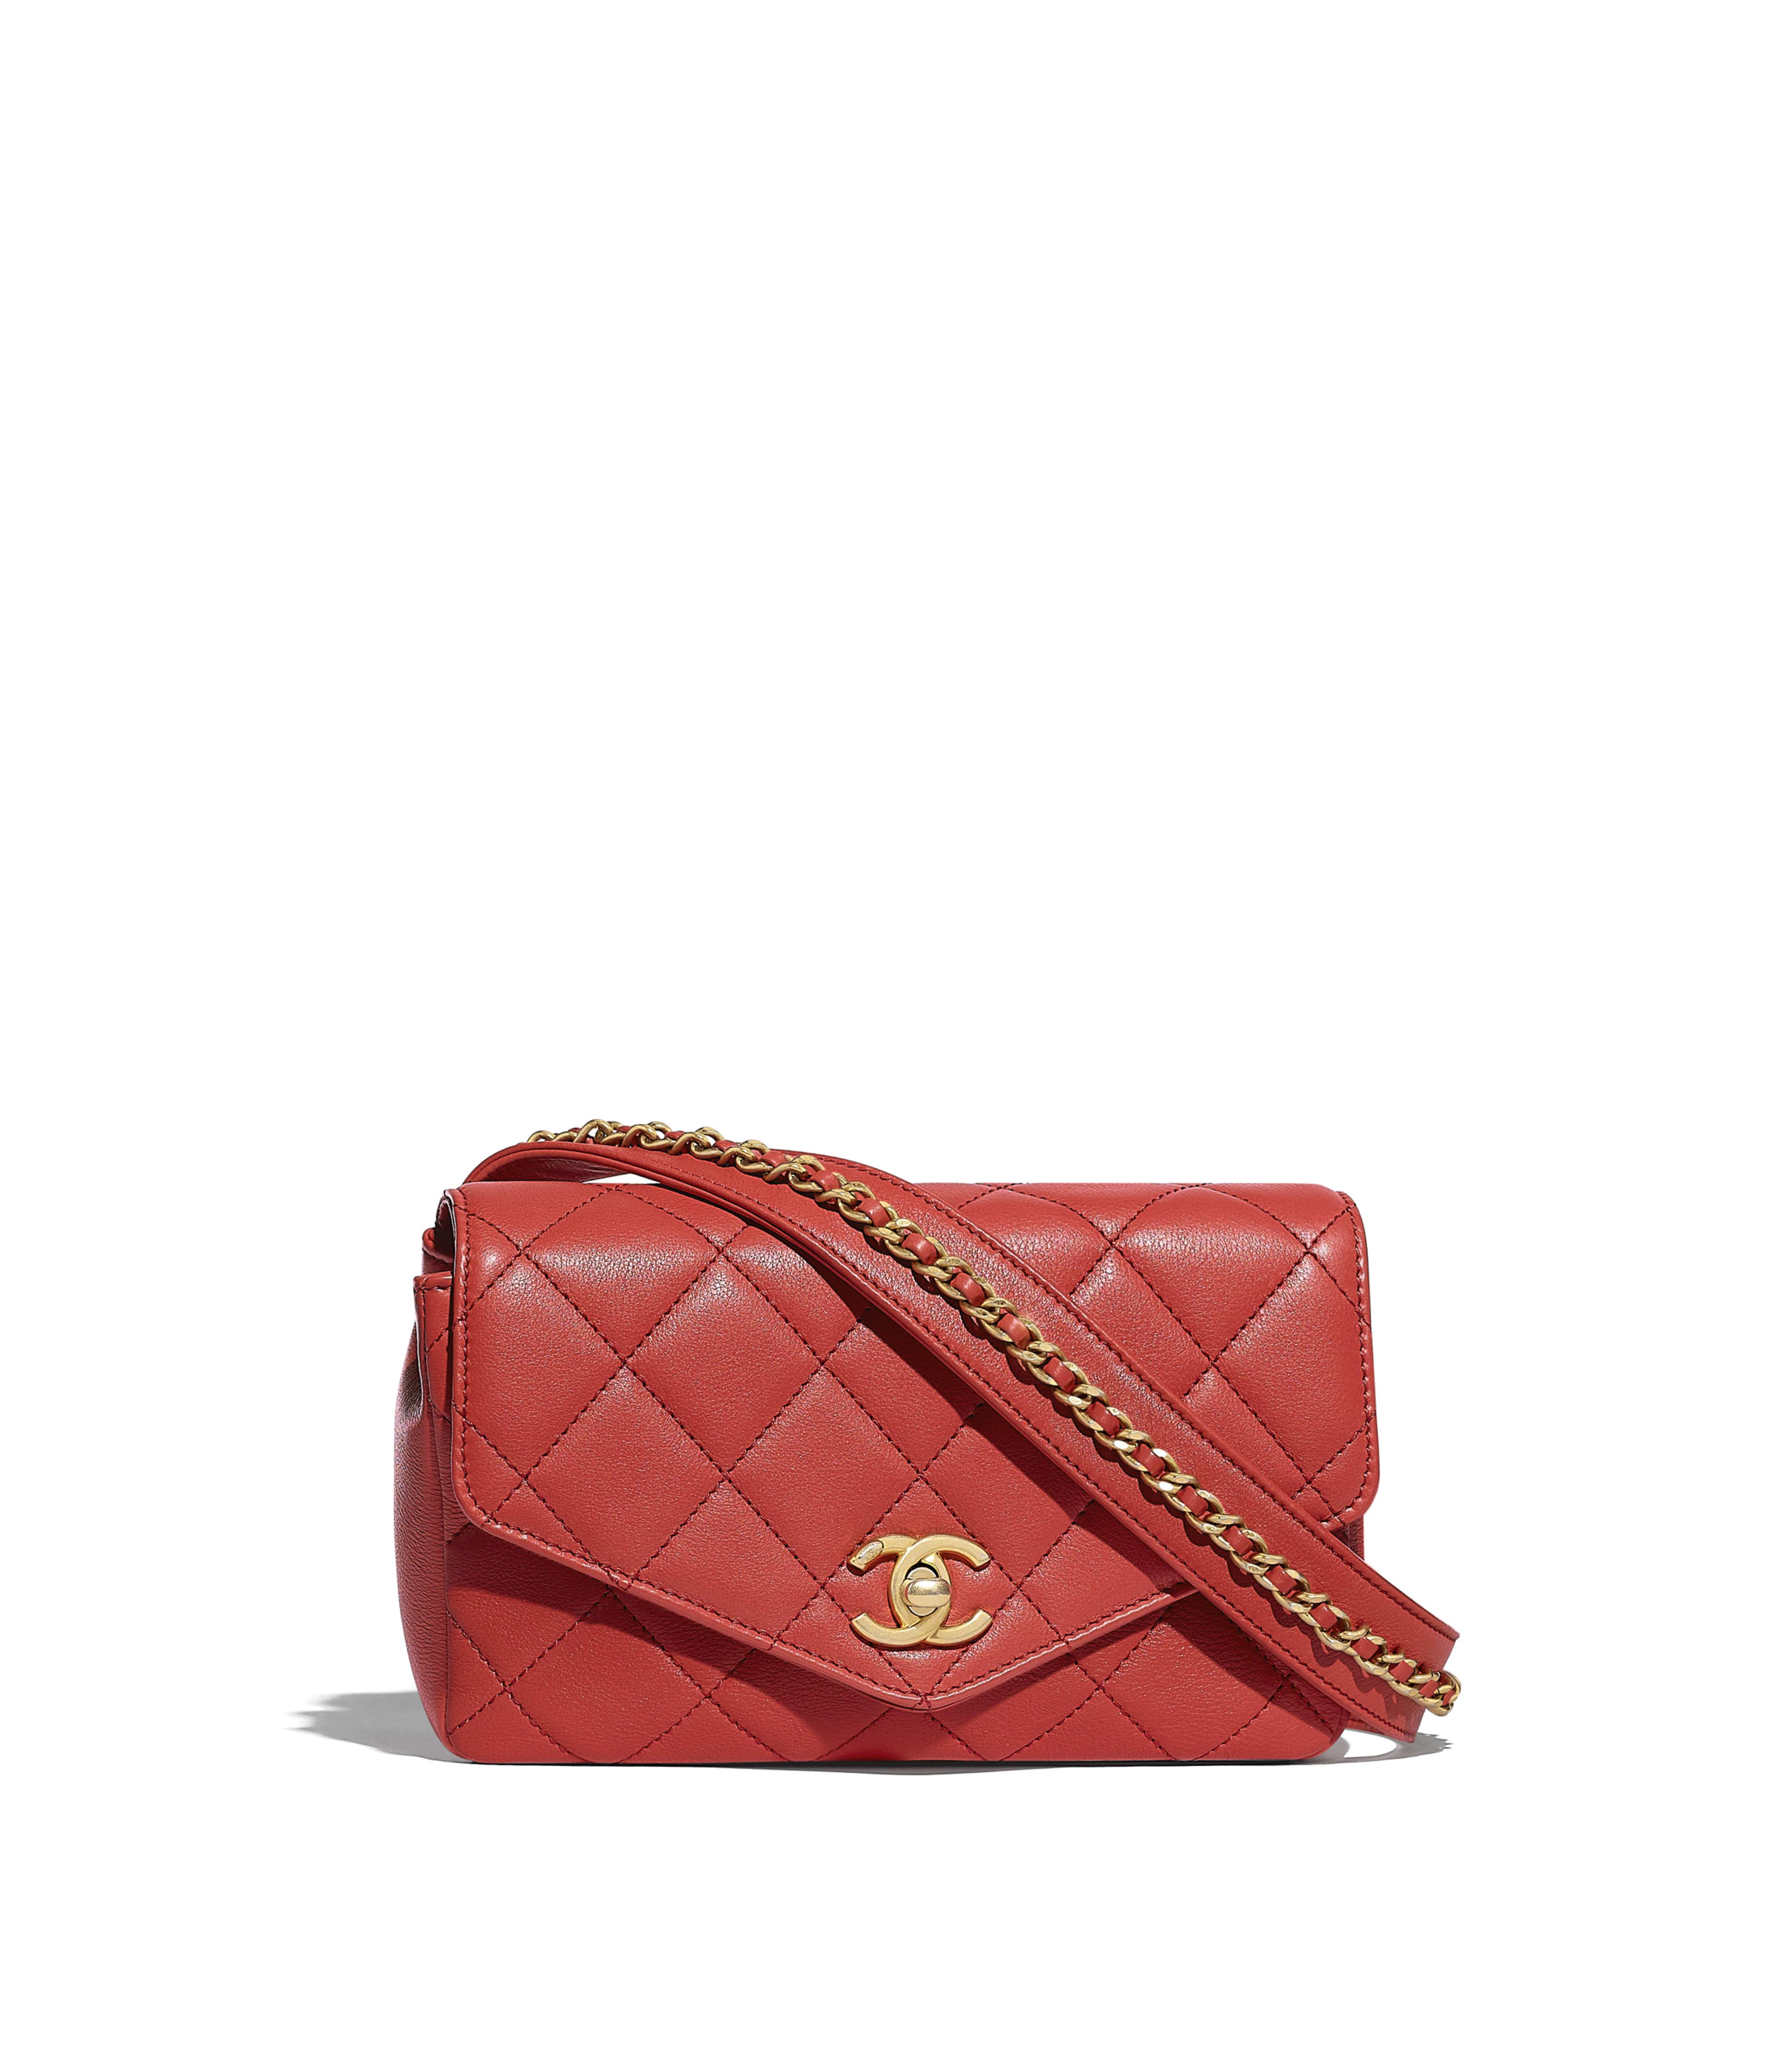 81ba6b94b1ac Calfskin & Gold-Tone Metal Beige Flap Bag with Top Handle | CHANEL